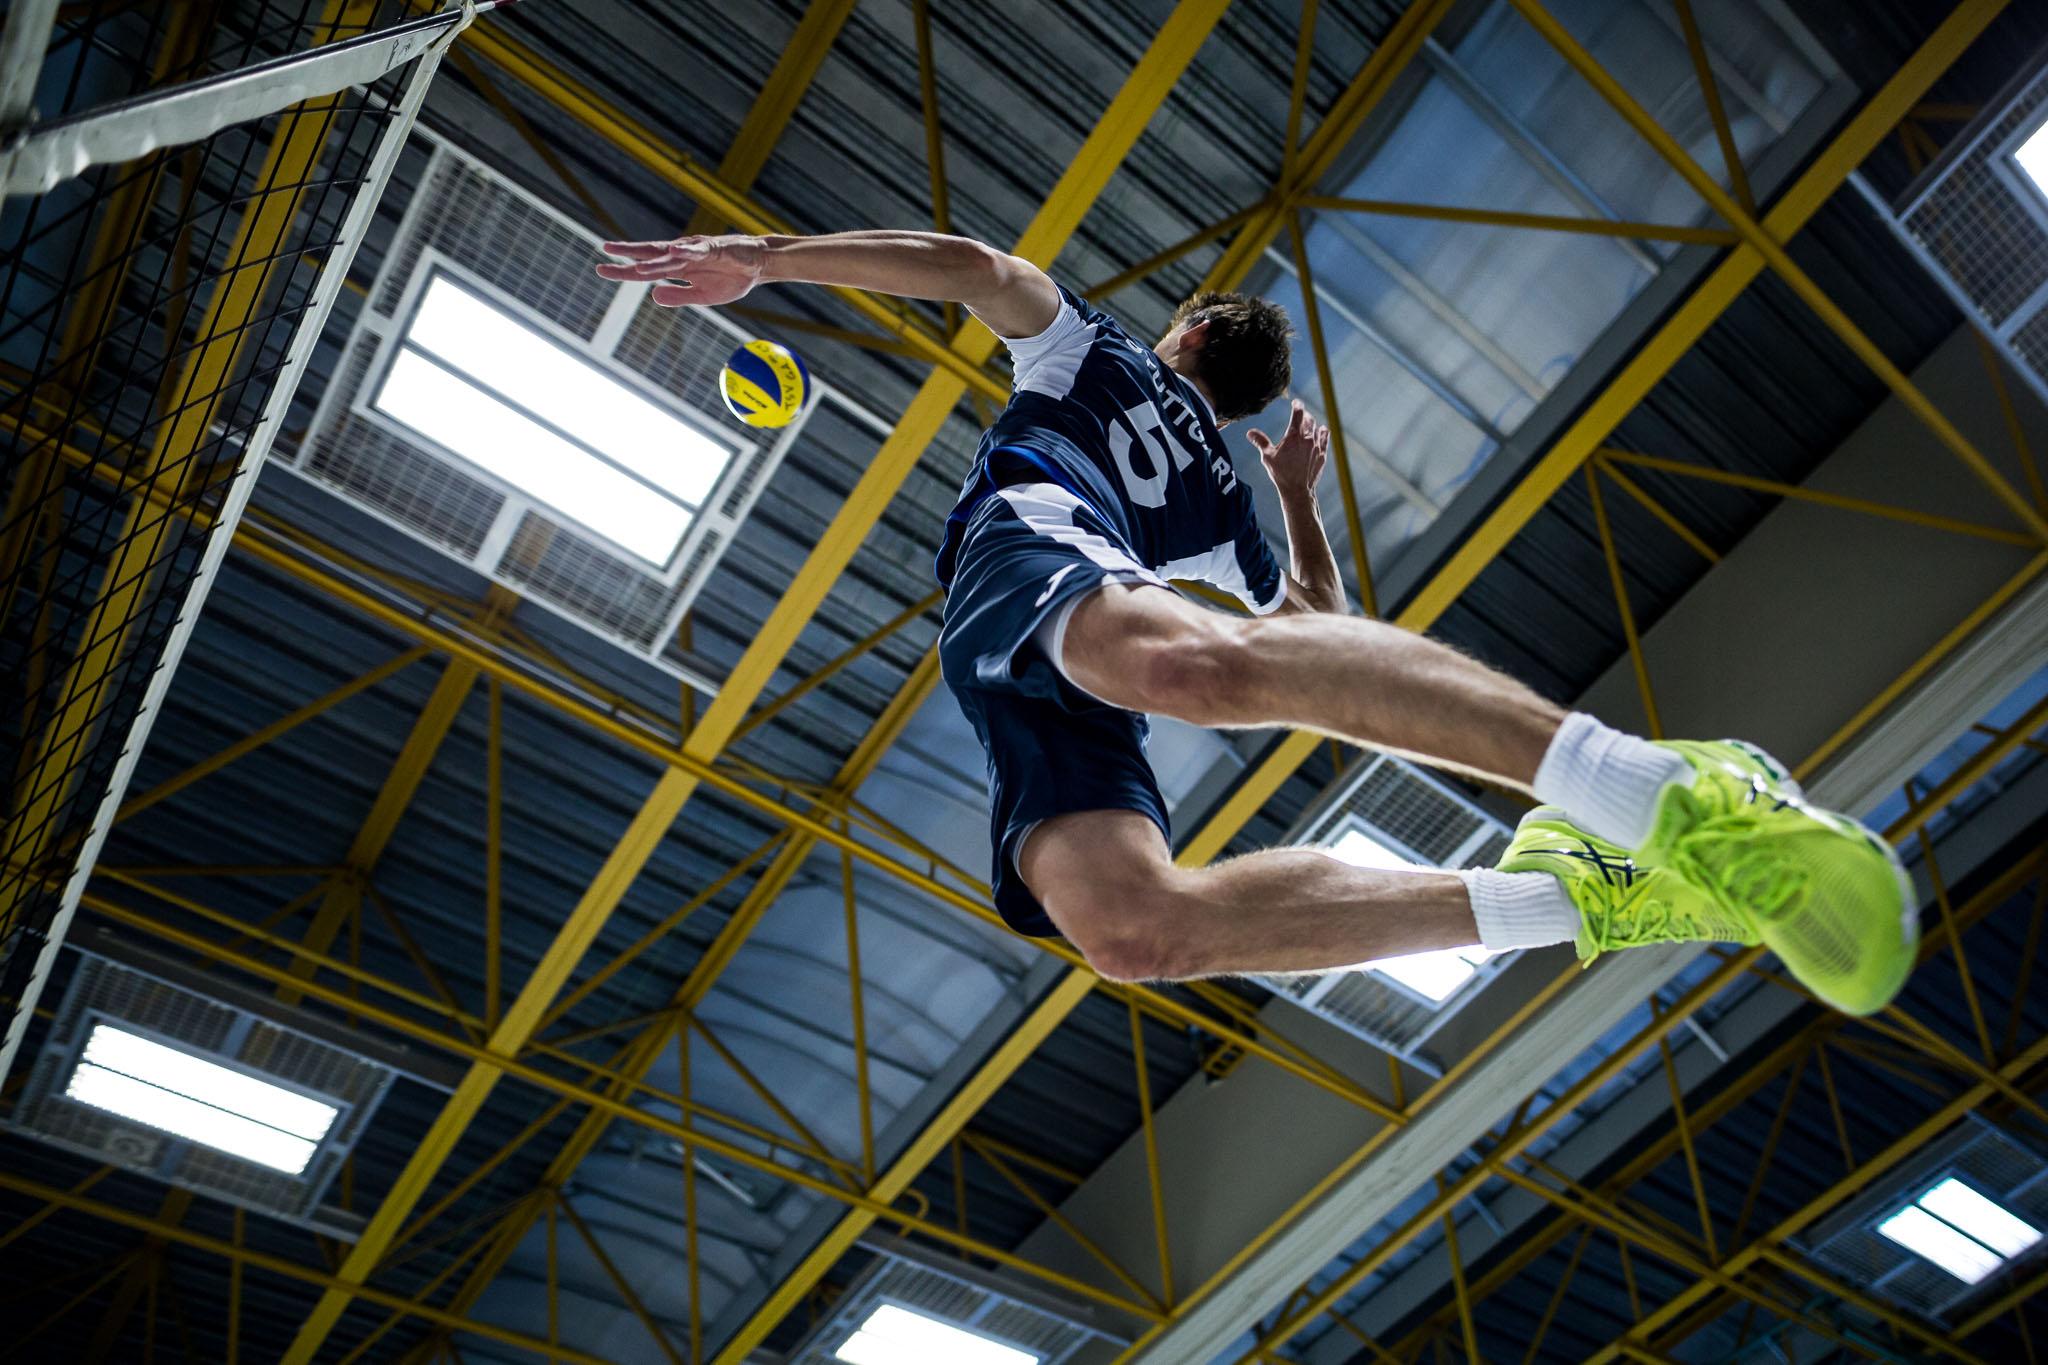 ; Volleyball Dritte Liga: TSV GA Stuttgart vs VfB Friedrichshafen 2, Stuttgart Hegel-Sporthalle, 20171111; Foto: Nils Wuechner / Eibner Pressefoto